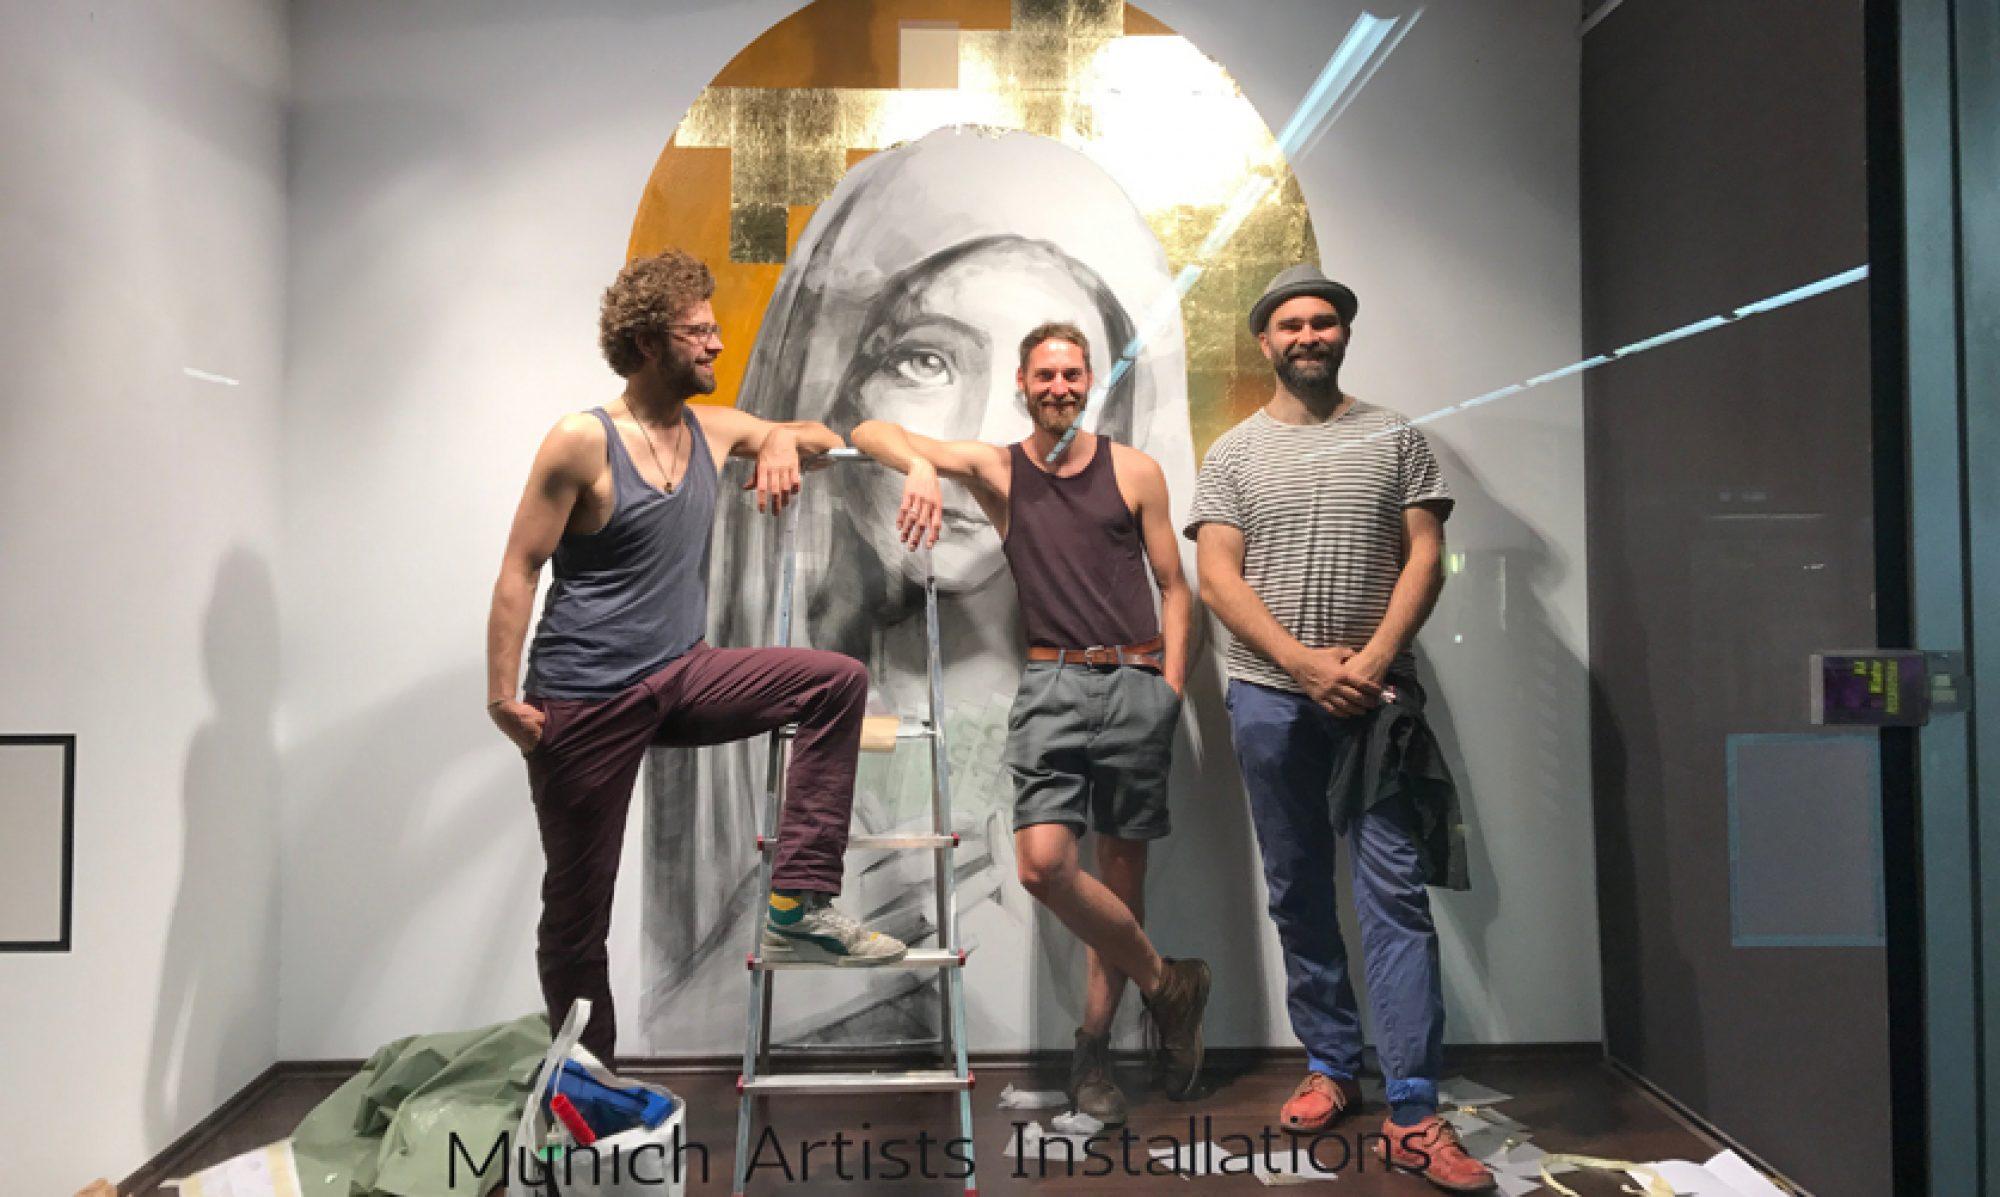 Munich Artists